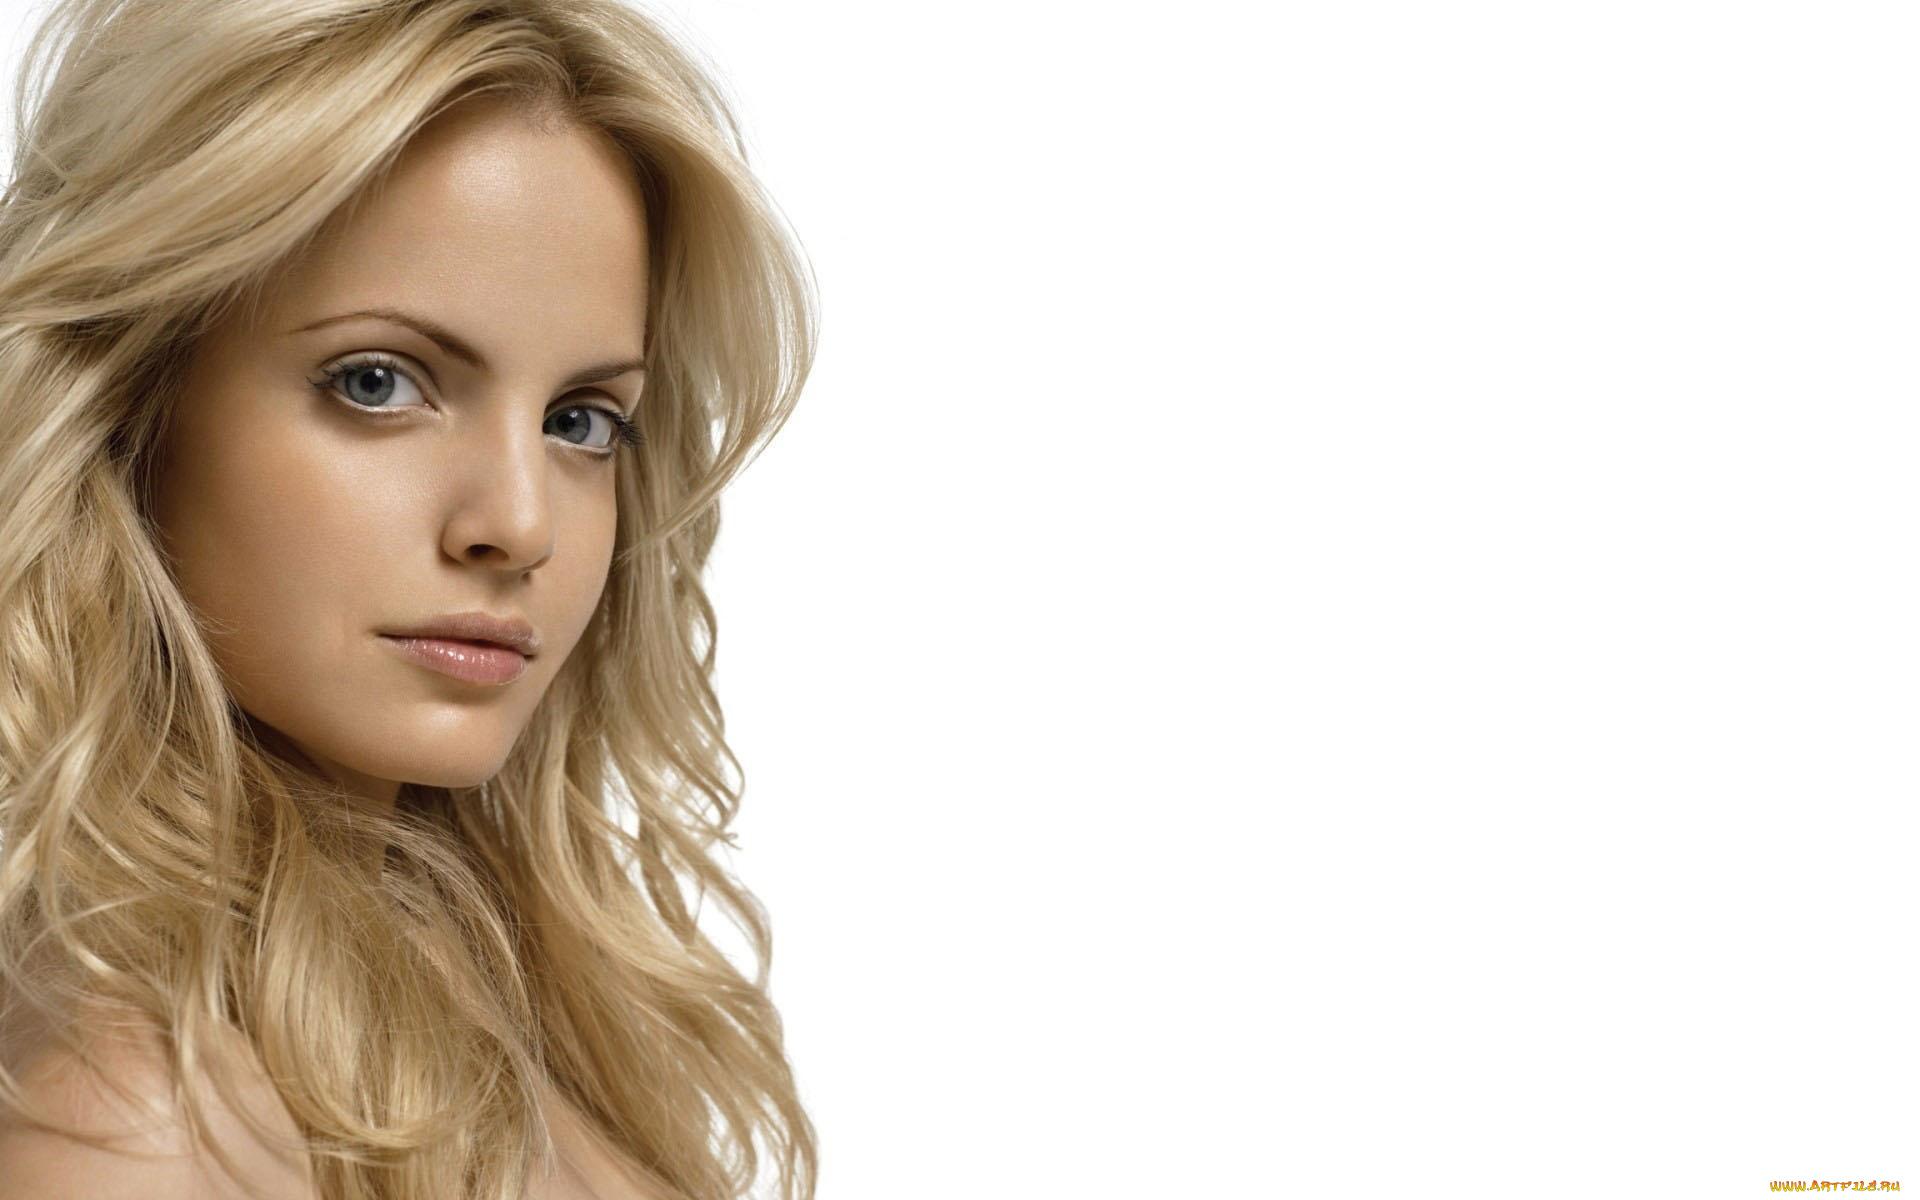 Блондинка взгляд девушка без смс